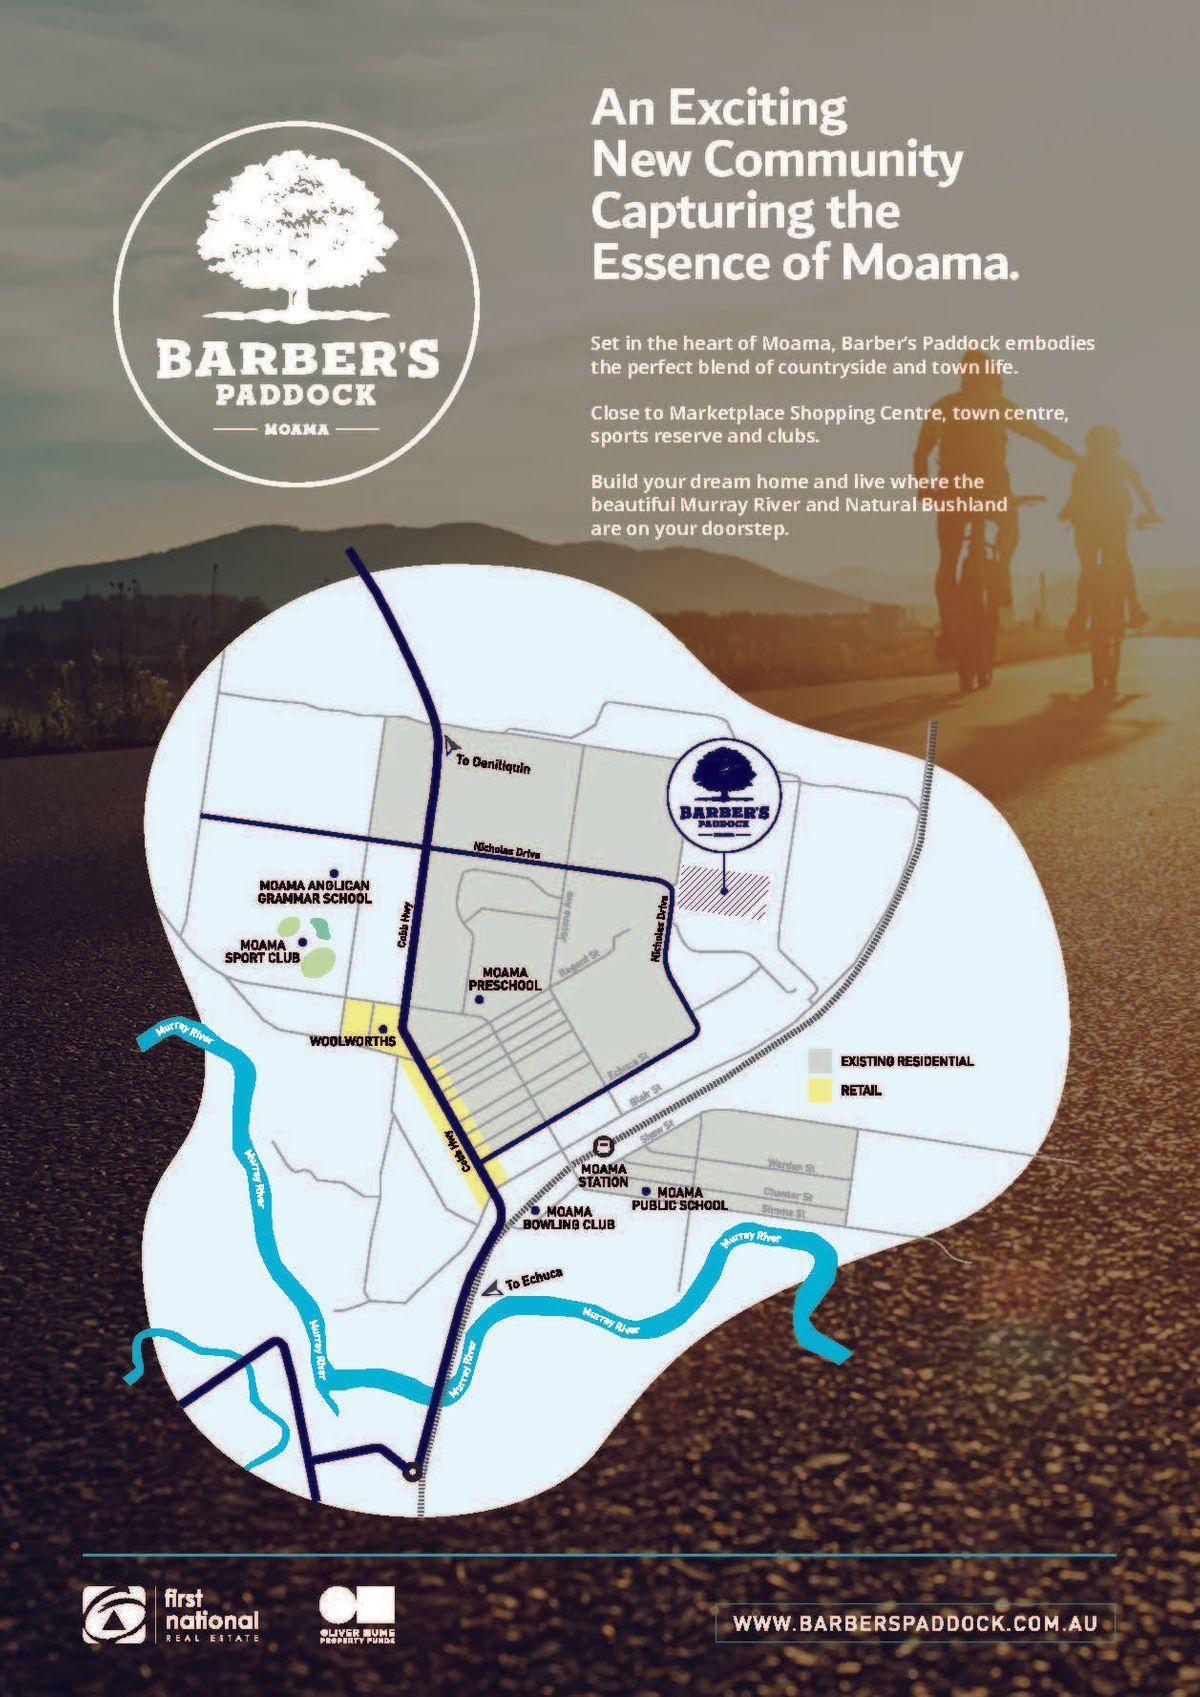 Lot 128-149/00 Stage 6 Barber's Paddock, Emmylou Place, Moama, NSW 2731